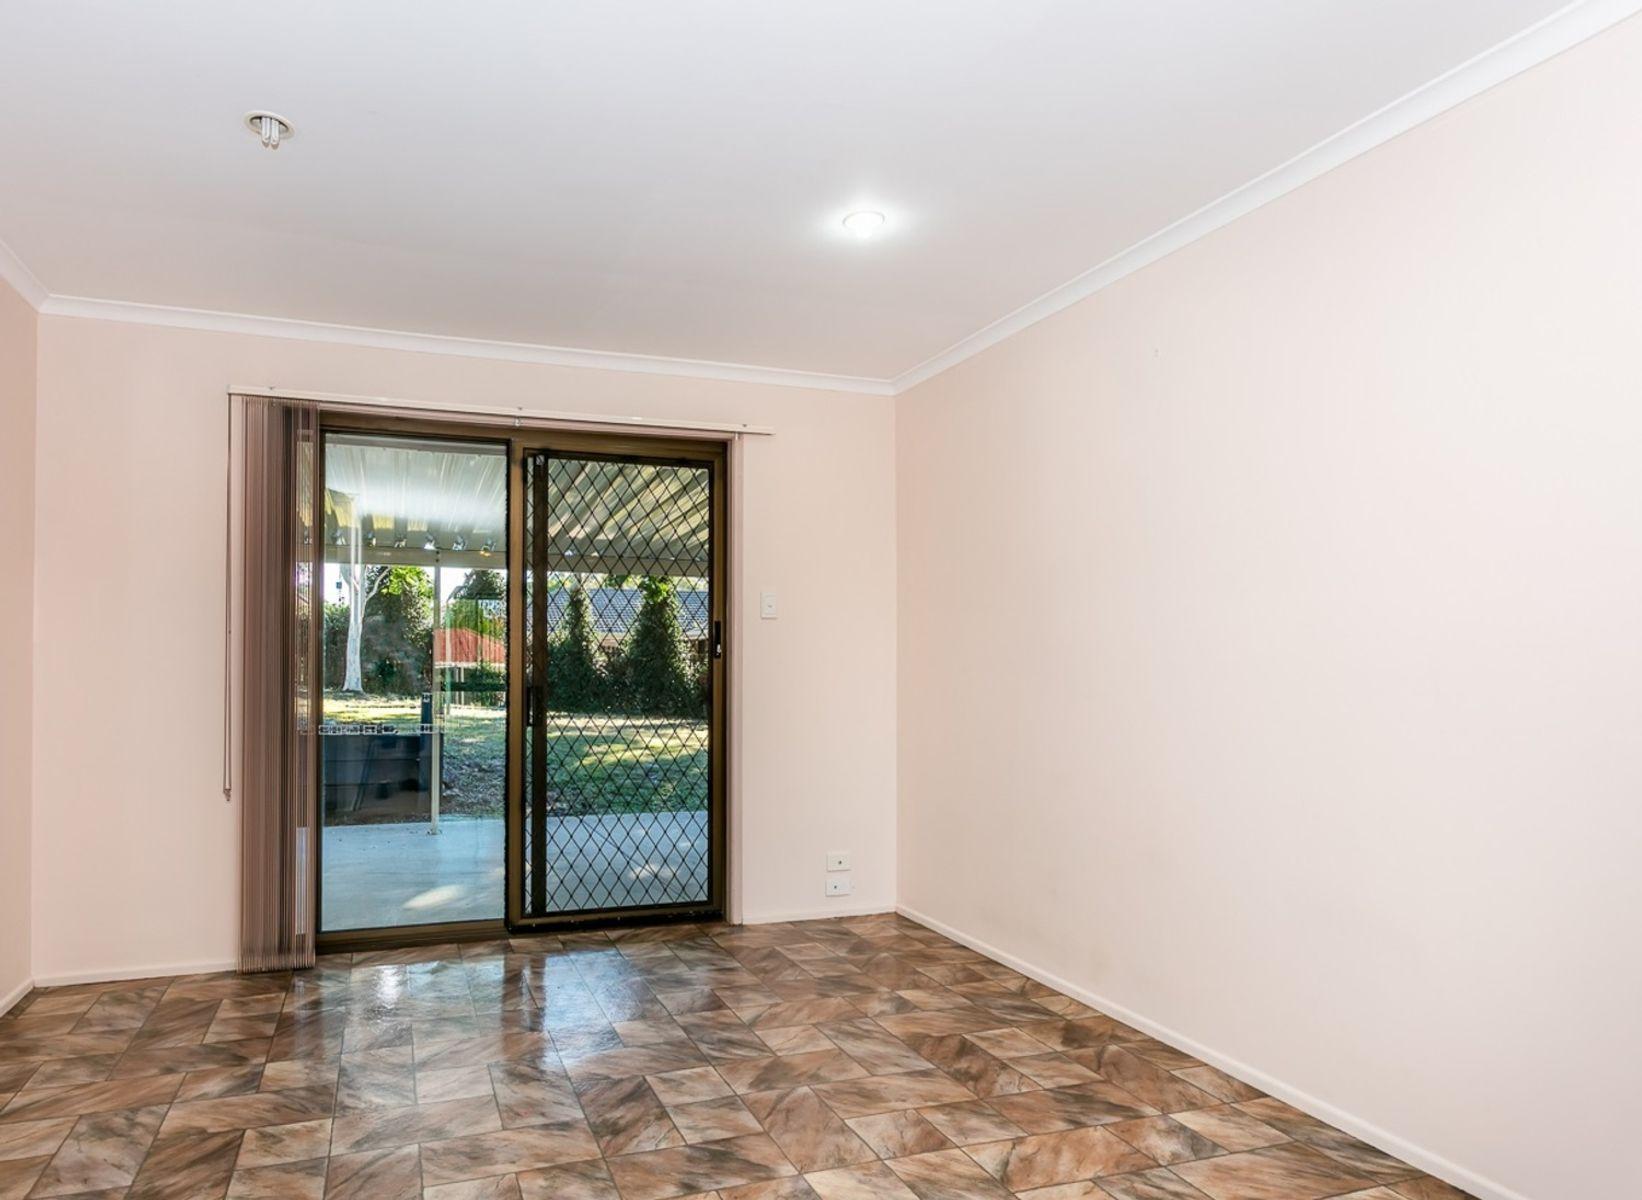 20 Hysten Street, Boronia Heights, QLD 4124